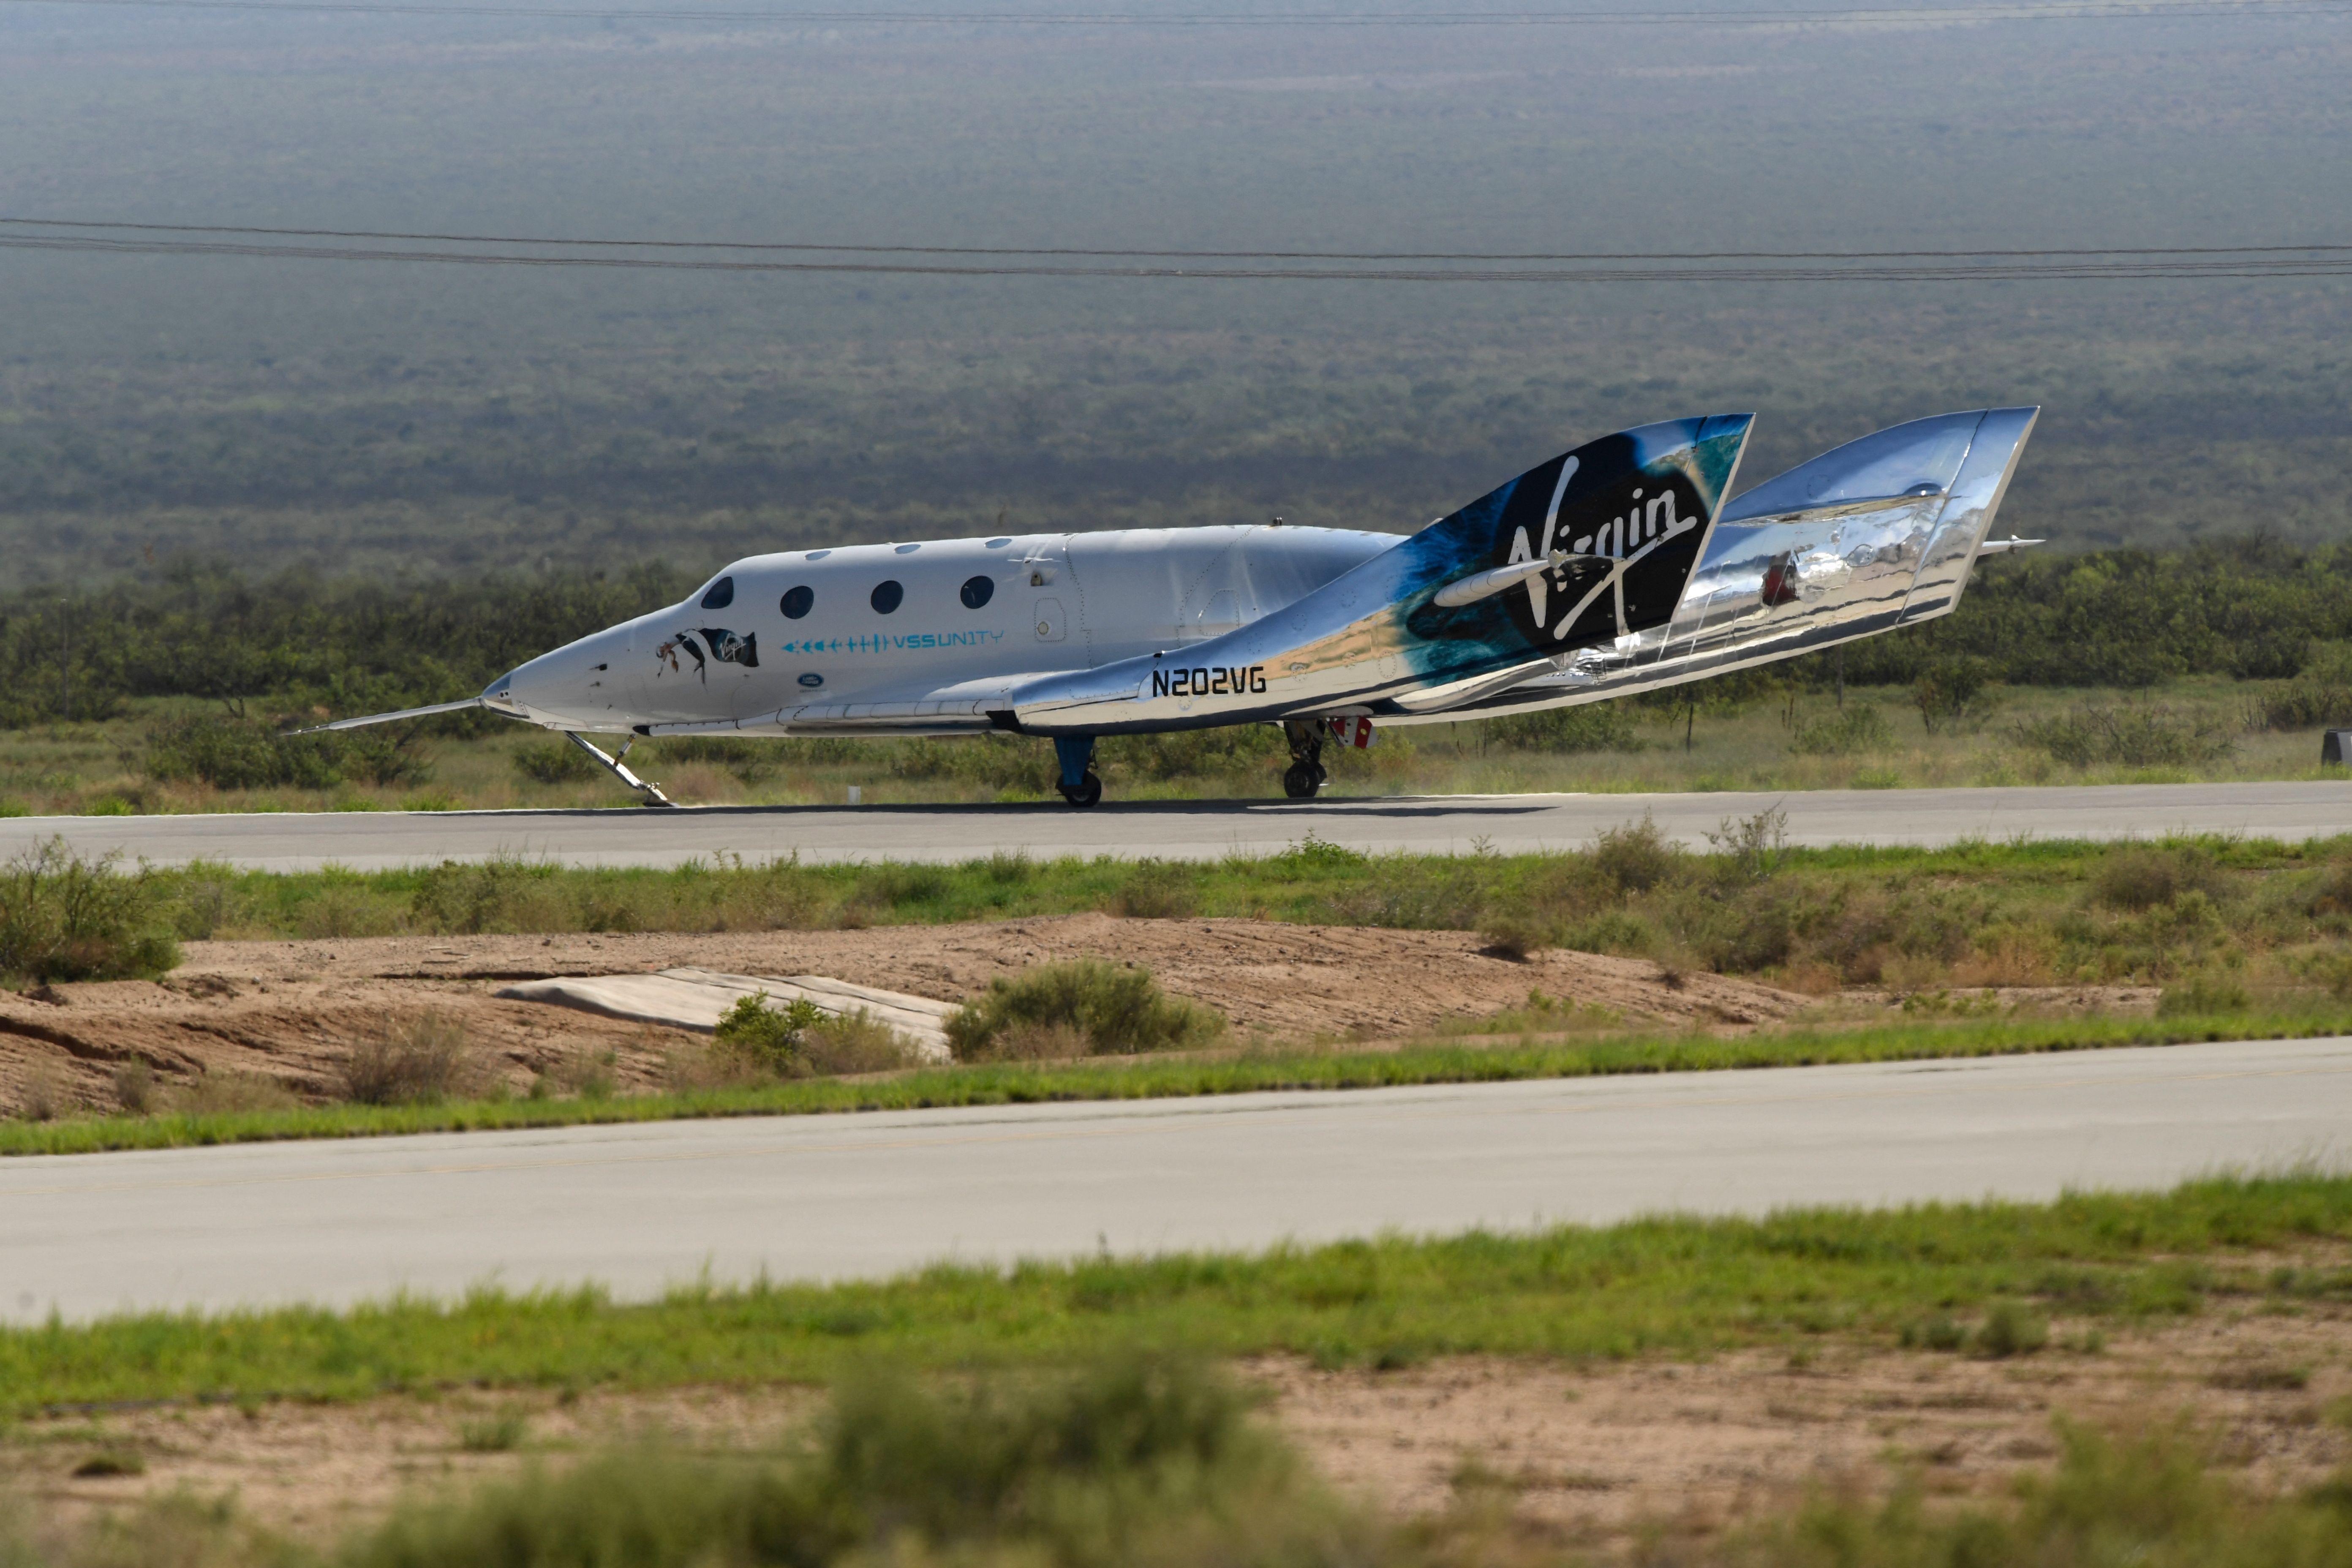 US-SPACE-TOURISM-BEZOS-BRANSON